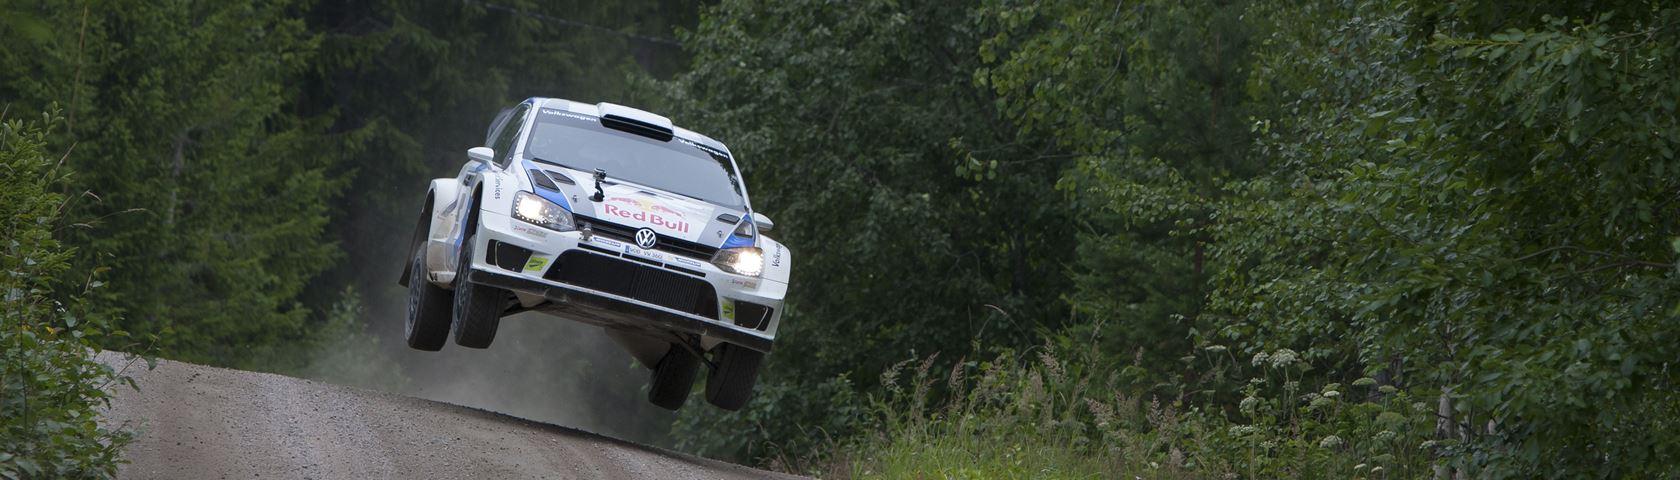 Flying VW Rally Car